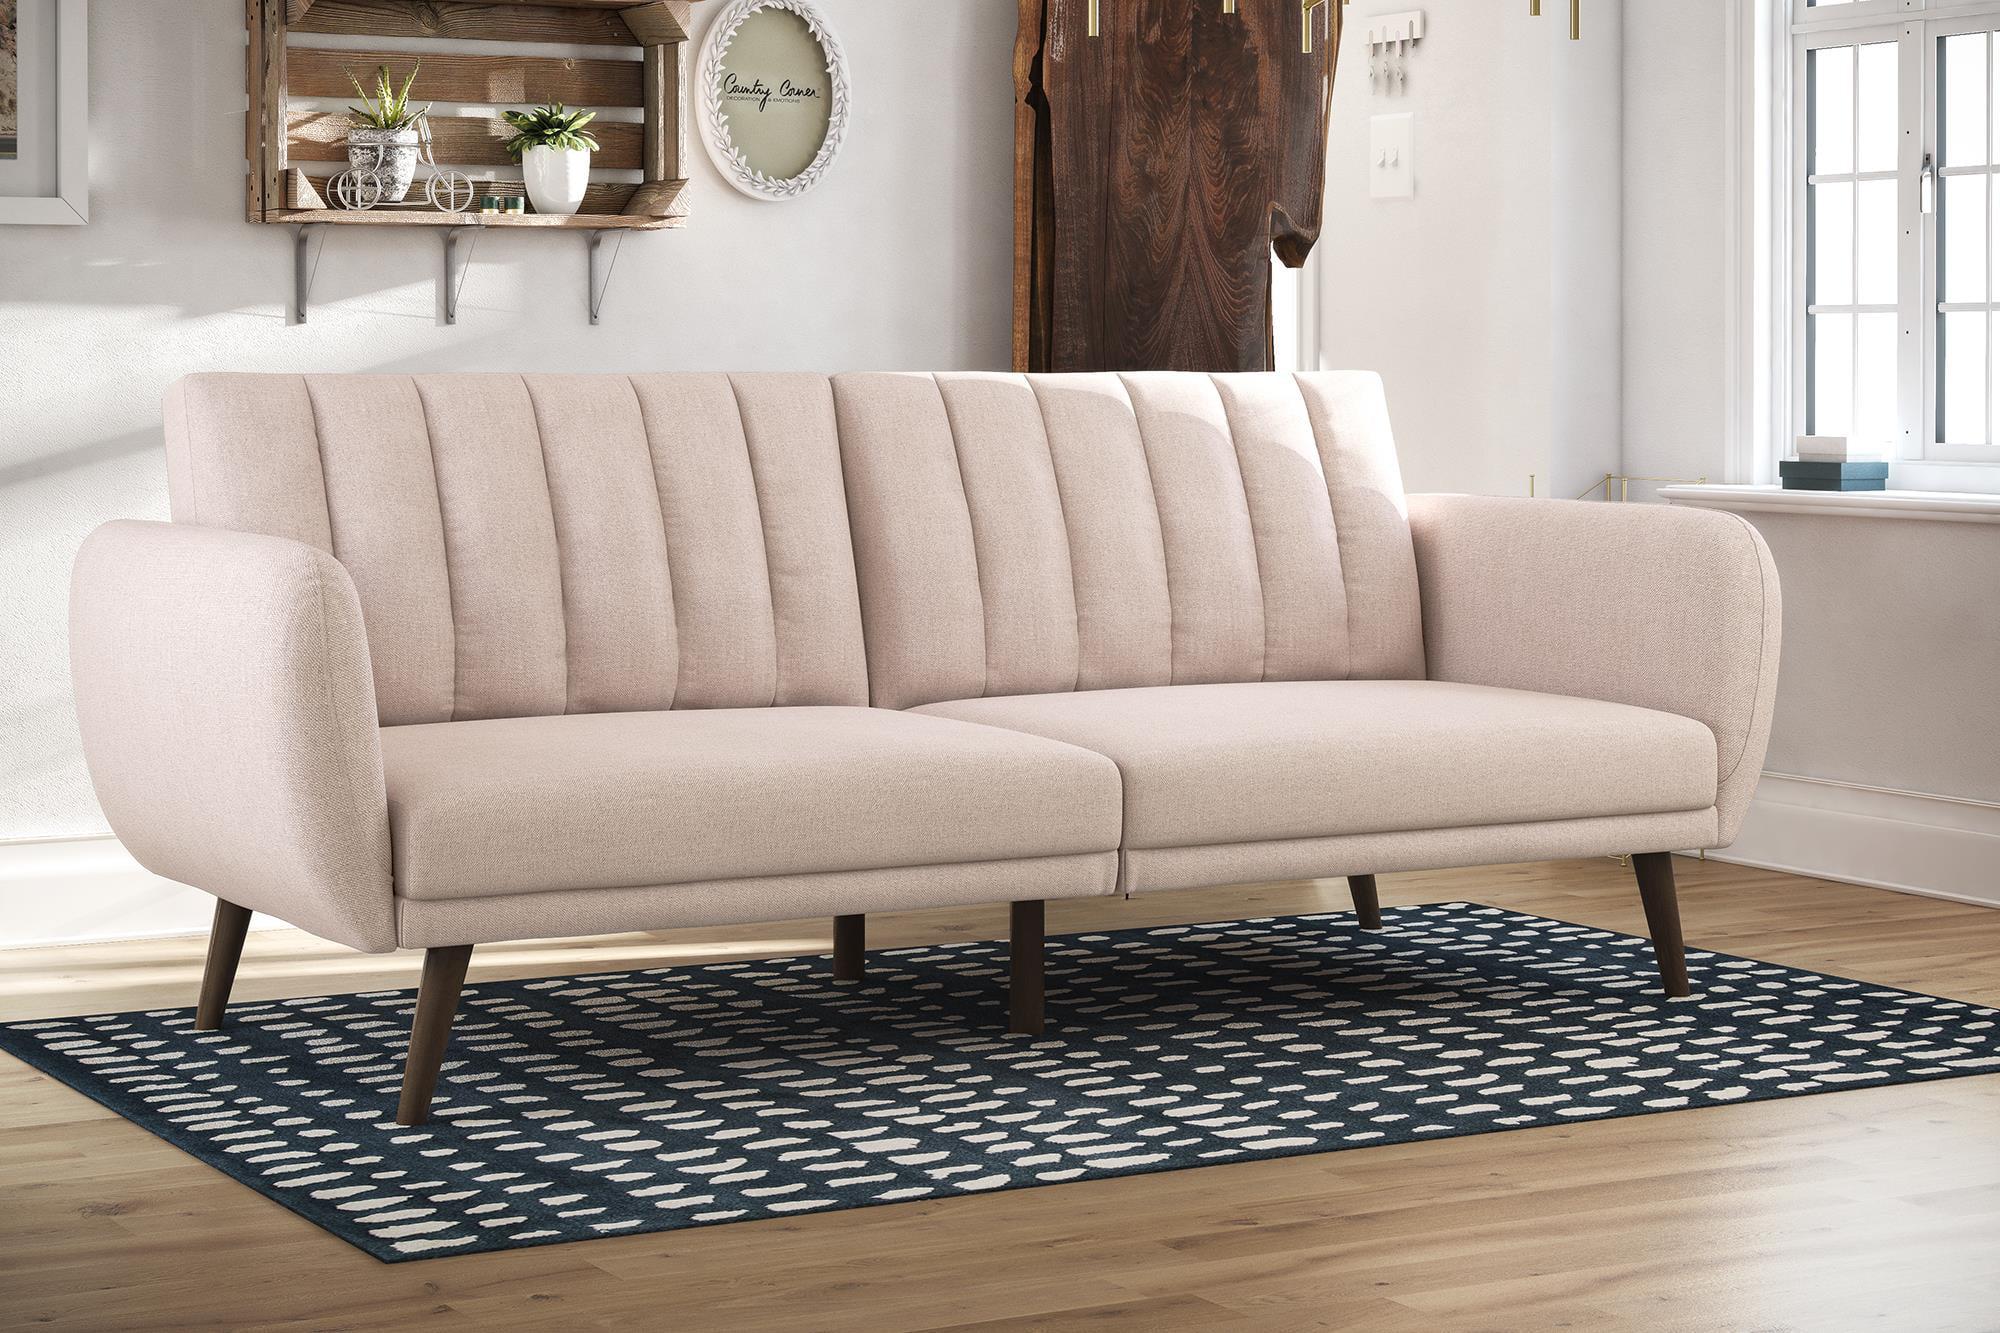 Novogratz Brittany Linen Futon, Multiple Colors by Dorel Home Products